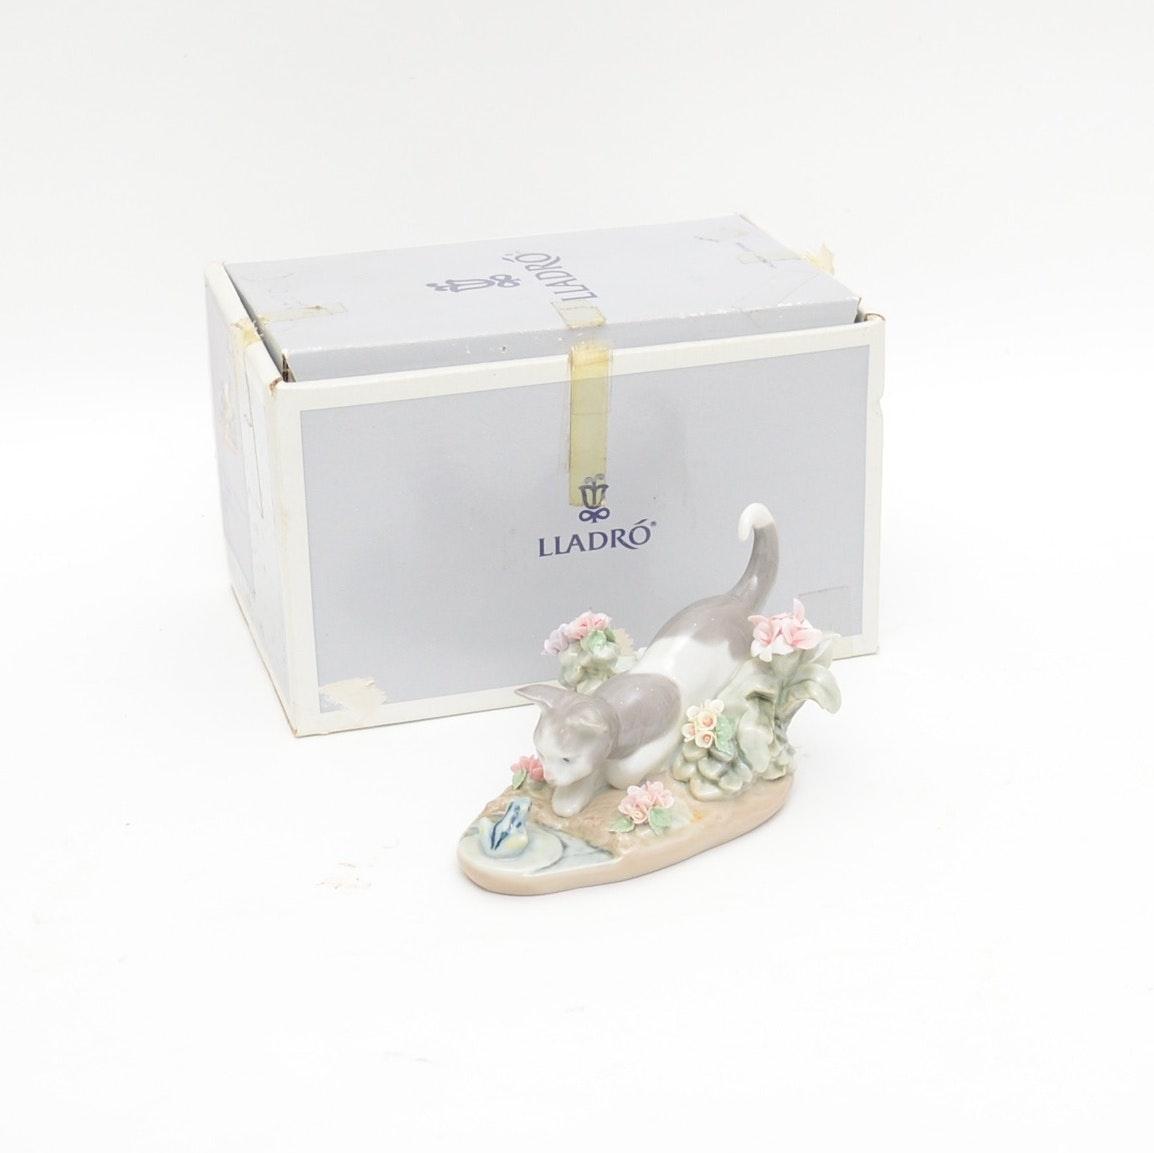 "1983 Lladró ""Kitty Confrontation"" Porcelain Figurine"